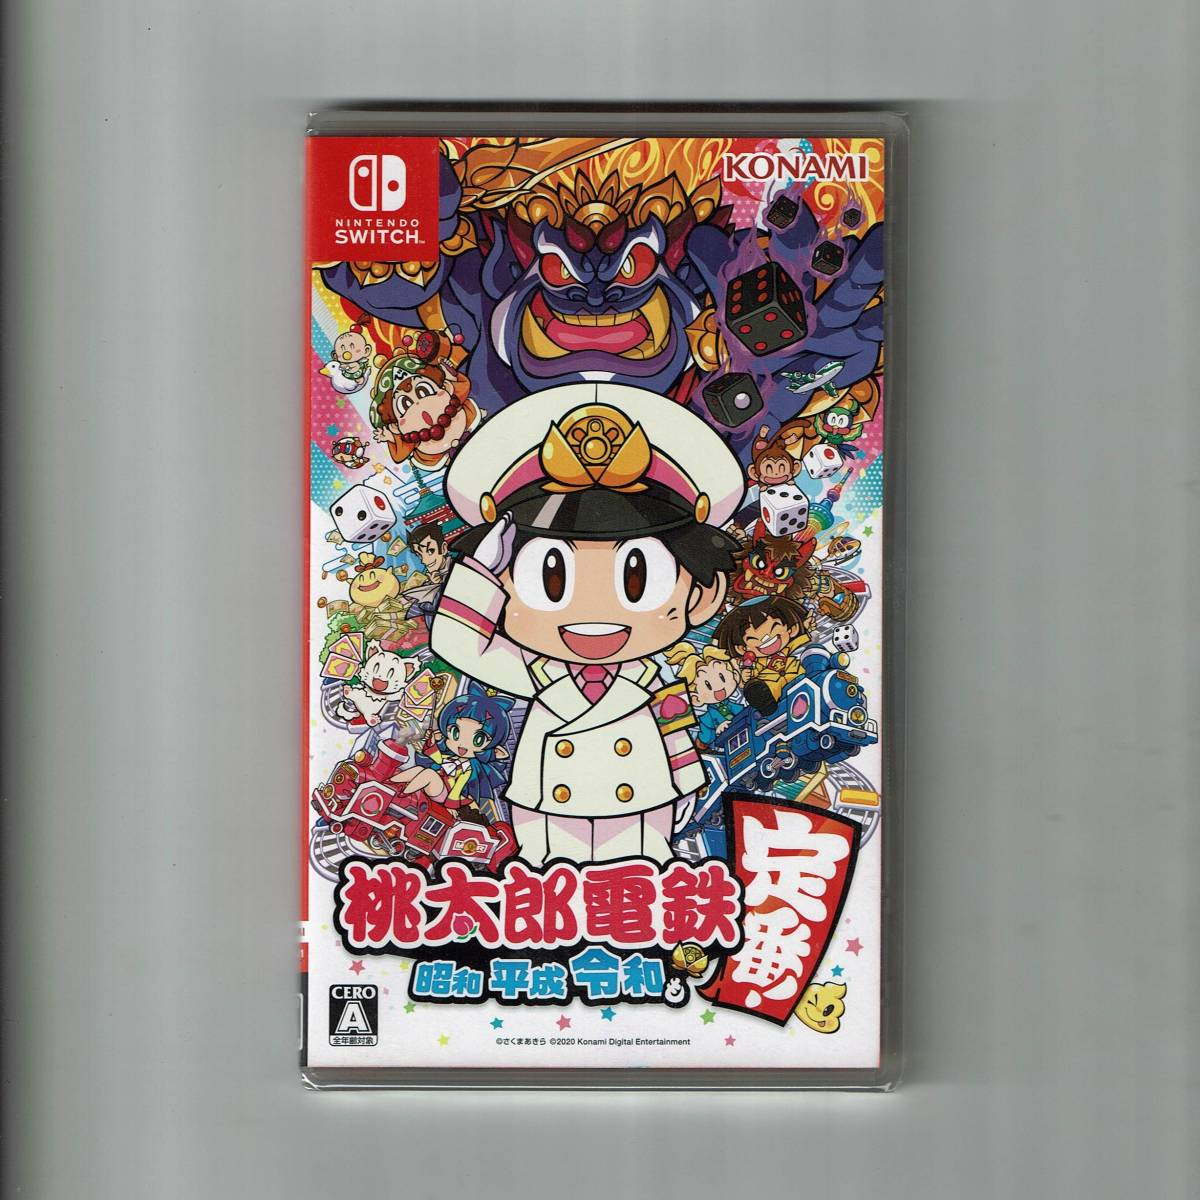 新品未開封 スイッチ switch 桃太郎電鉄 ~昭和 平成 令和も定番! ~ 桃鉄_画像1